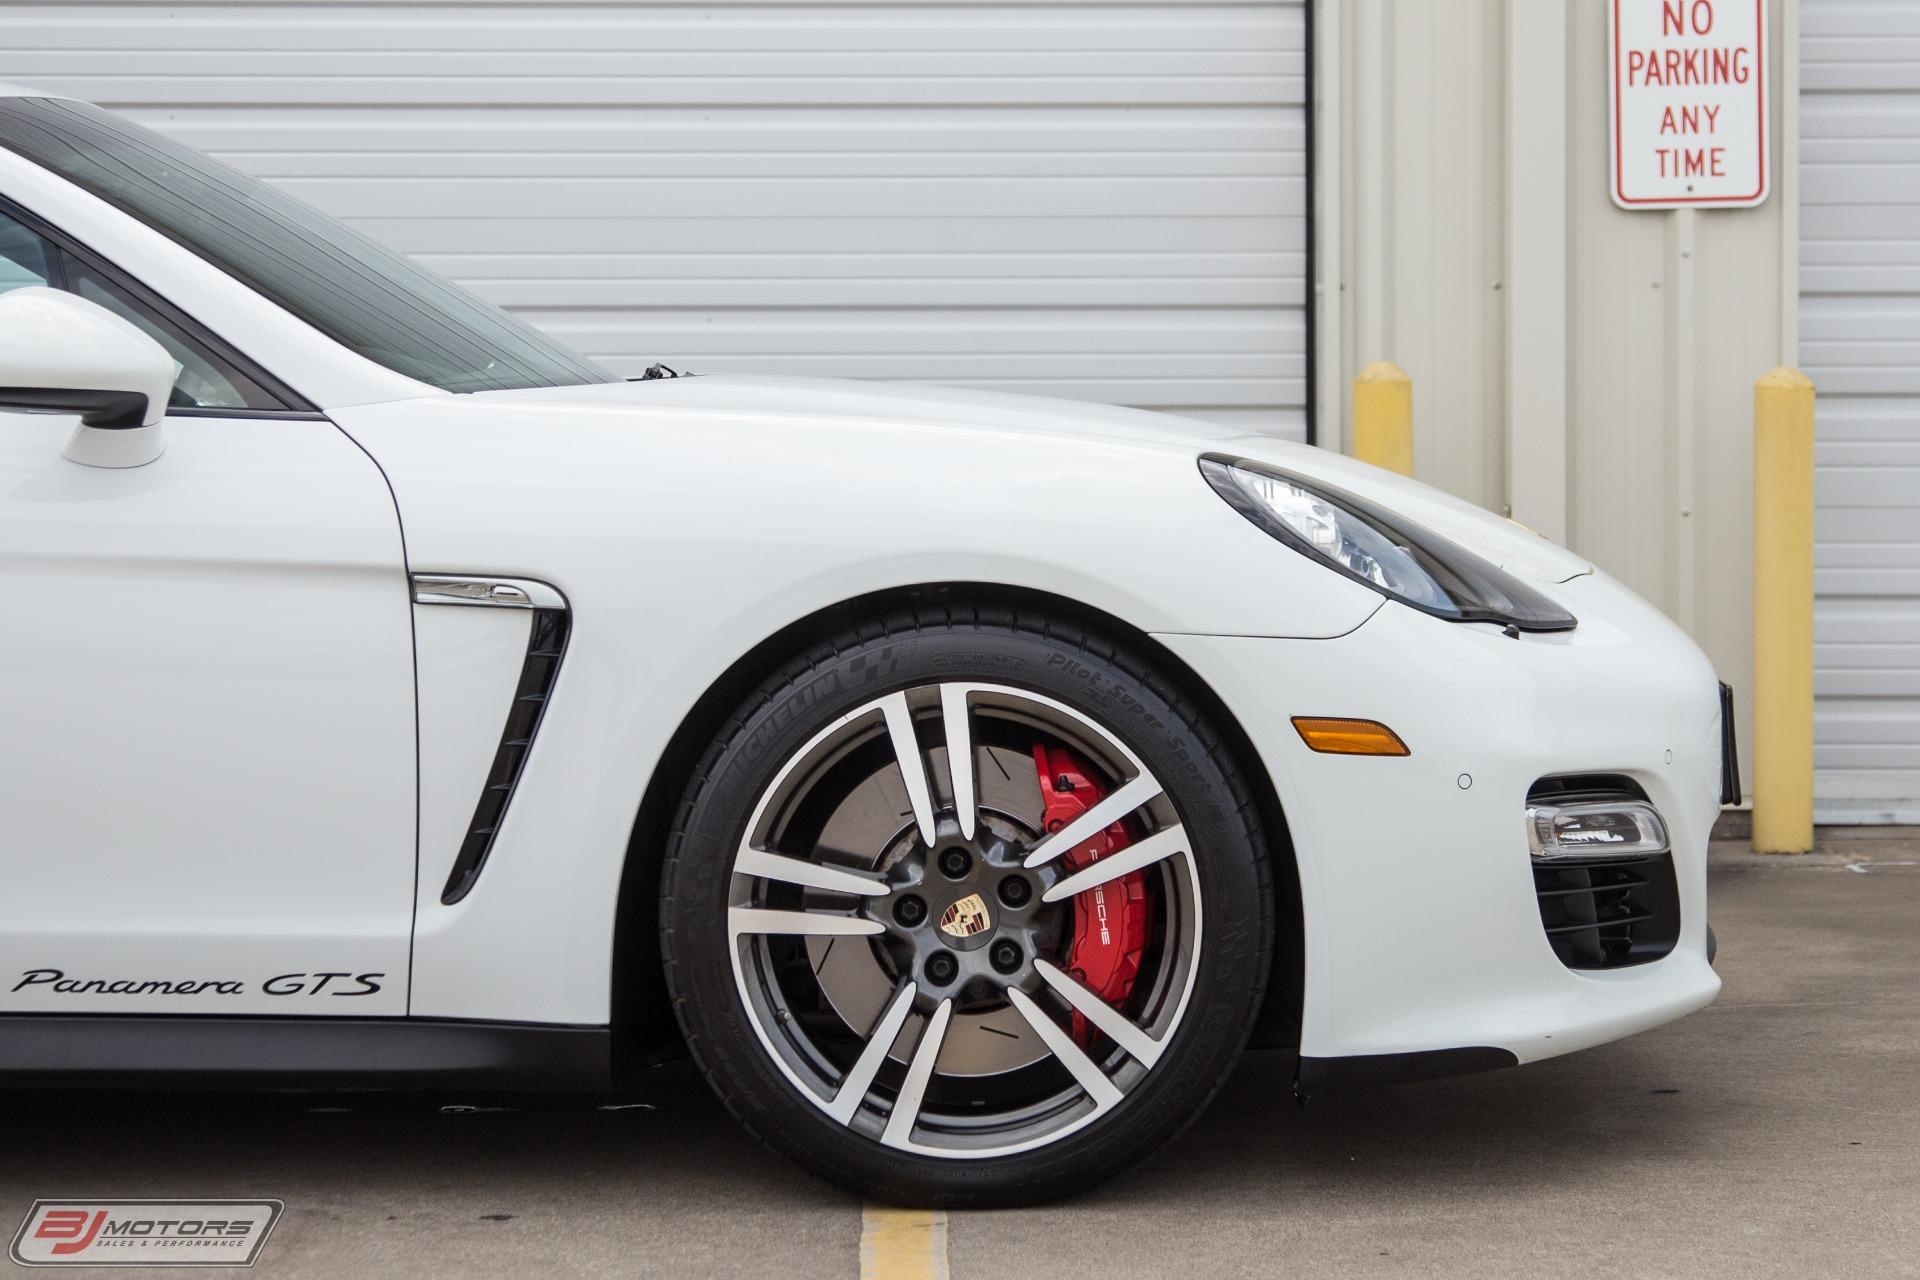 Used-2013-Porsche-Panamera-GTS